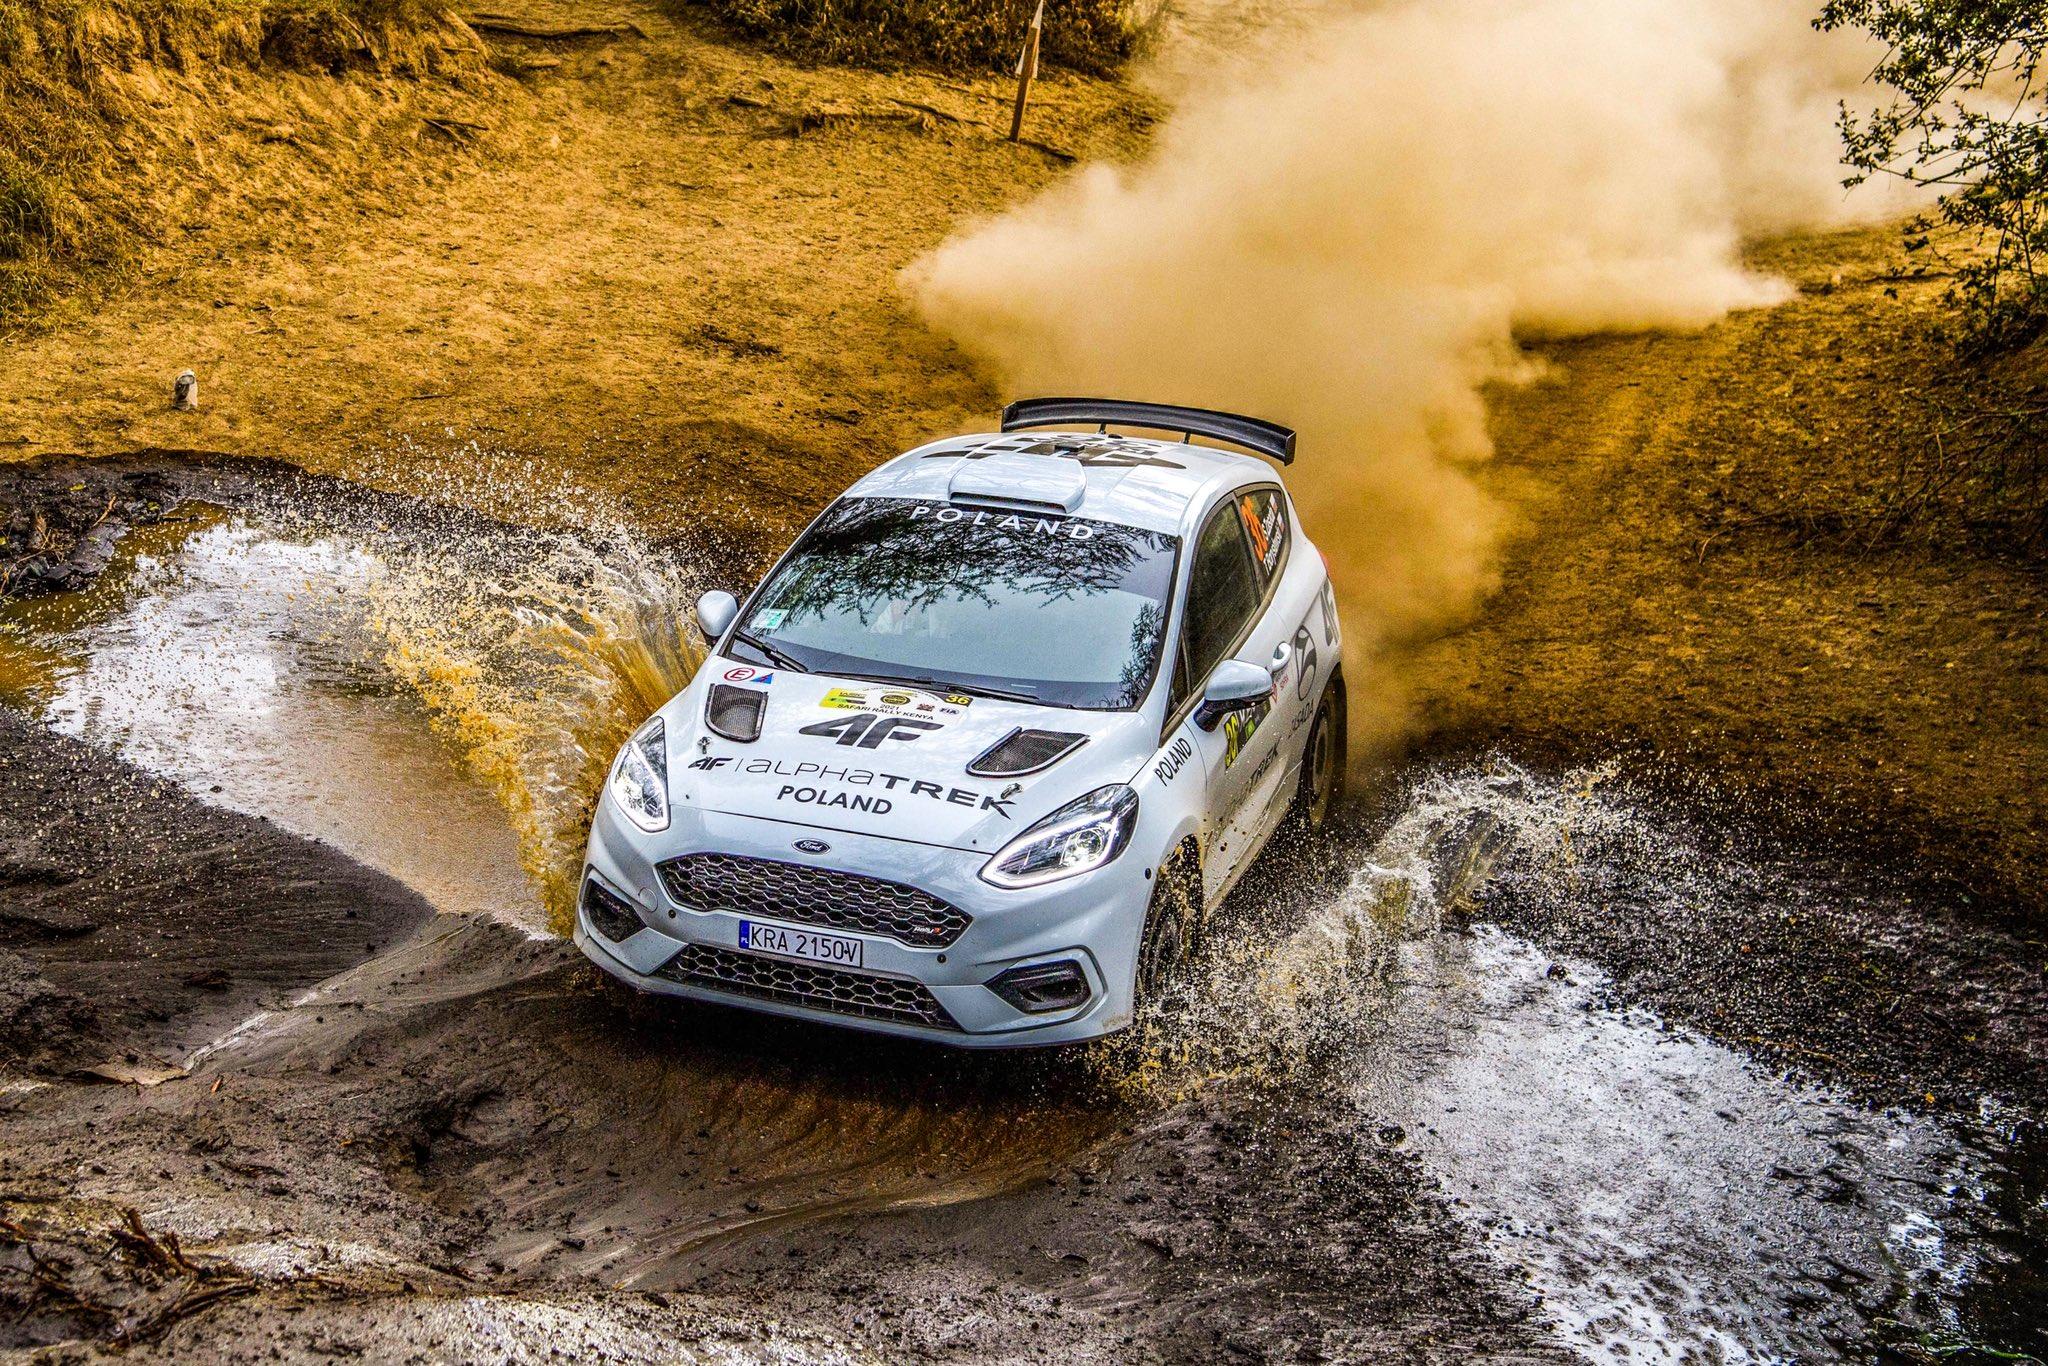 WRC: Safari Rally Kenya [23-27 Junio] - Página 6 E45eVvxWQAI3J1E?format=jpg&name=large